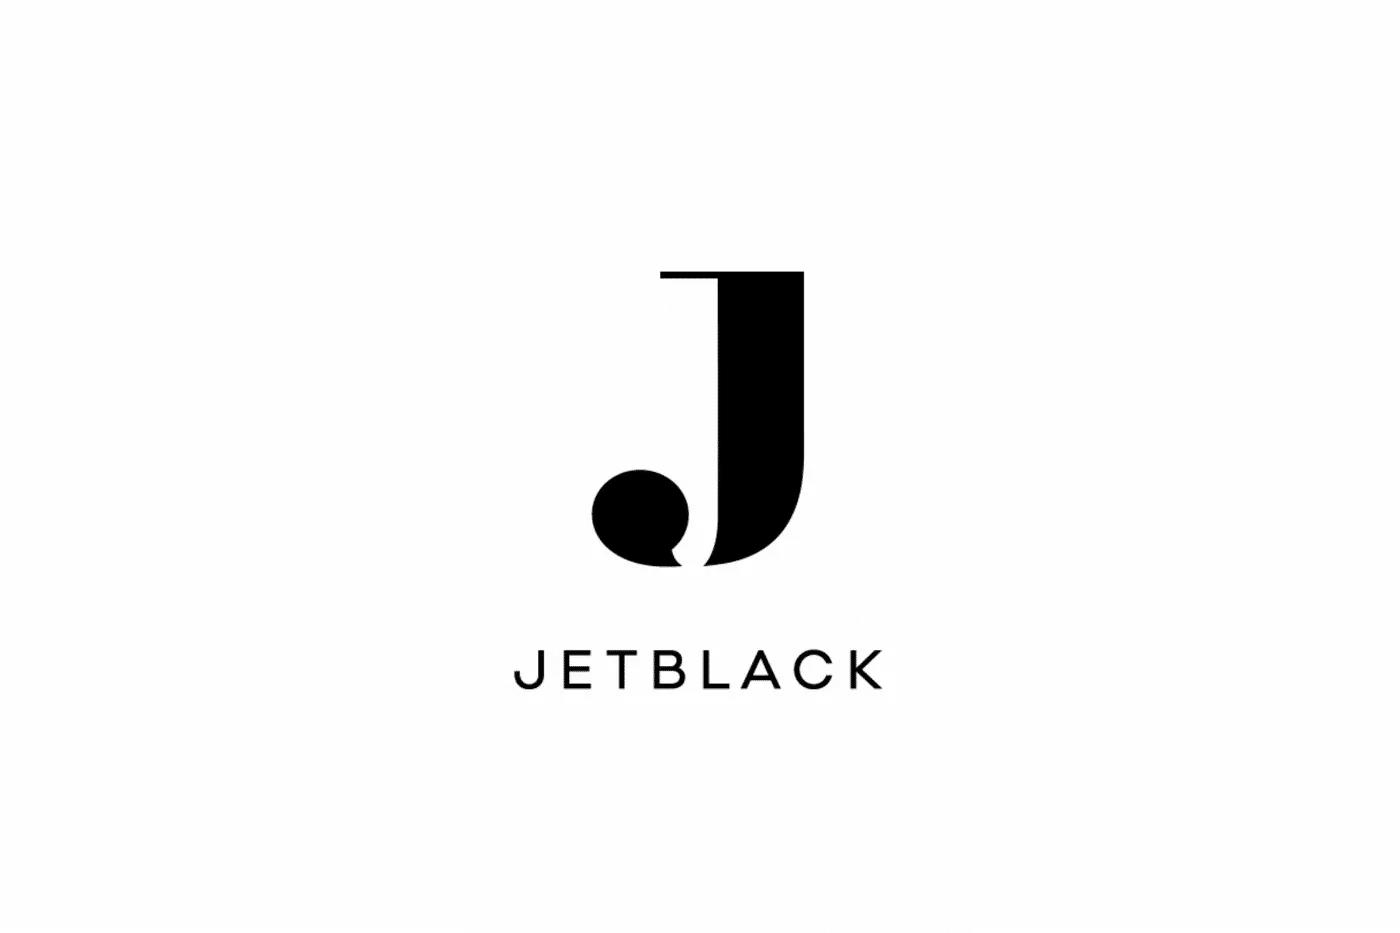 Walmart shutting down Jetblack